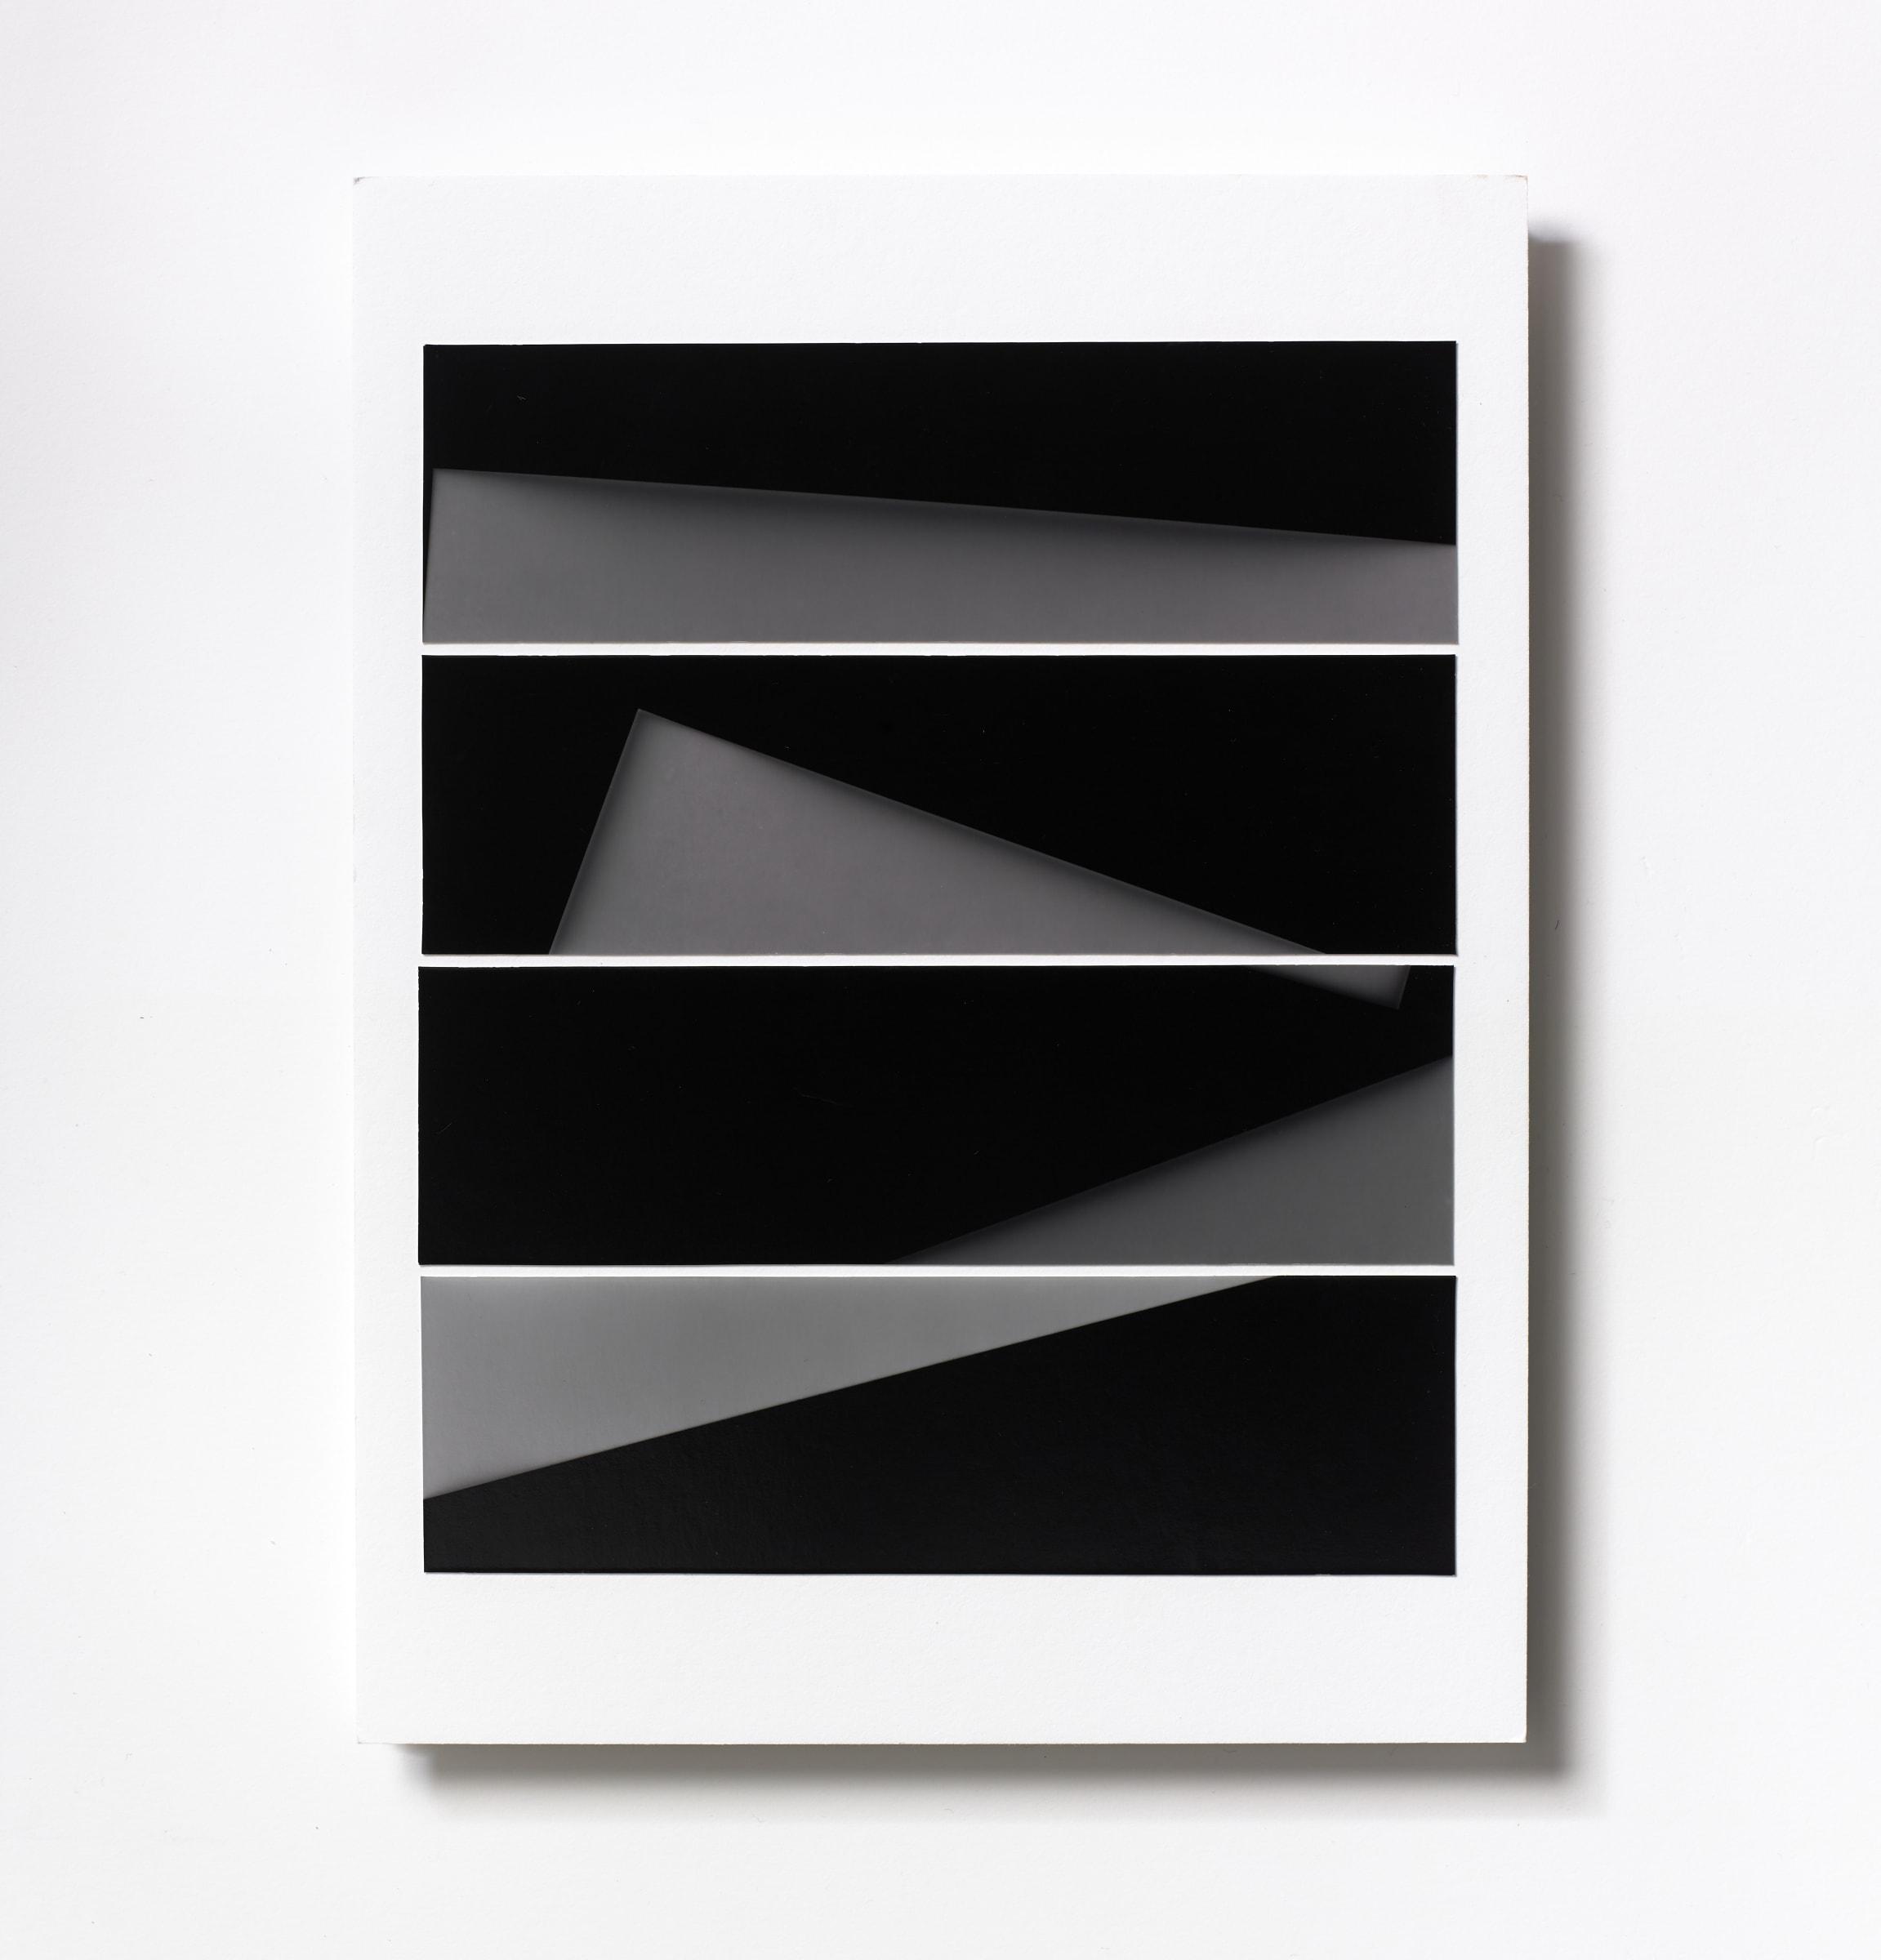 "<span class=""link fancybox-details-link""><a href=""/content/feature/122/artworks552/"">View Detail Page</a></span><div class=""medium"">Silver Gelatin Photogram Print Collage<br /> Unique</div> <div class=""dimensions"">30.5 x 22.9 cm<br /> 12 x 9 in</div>"